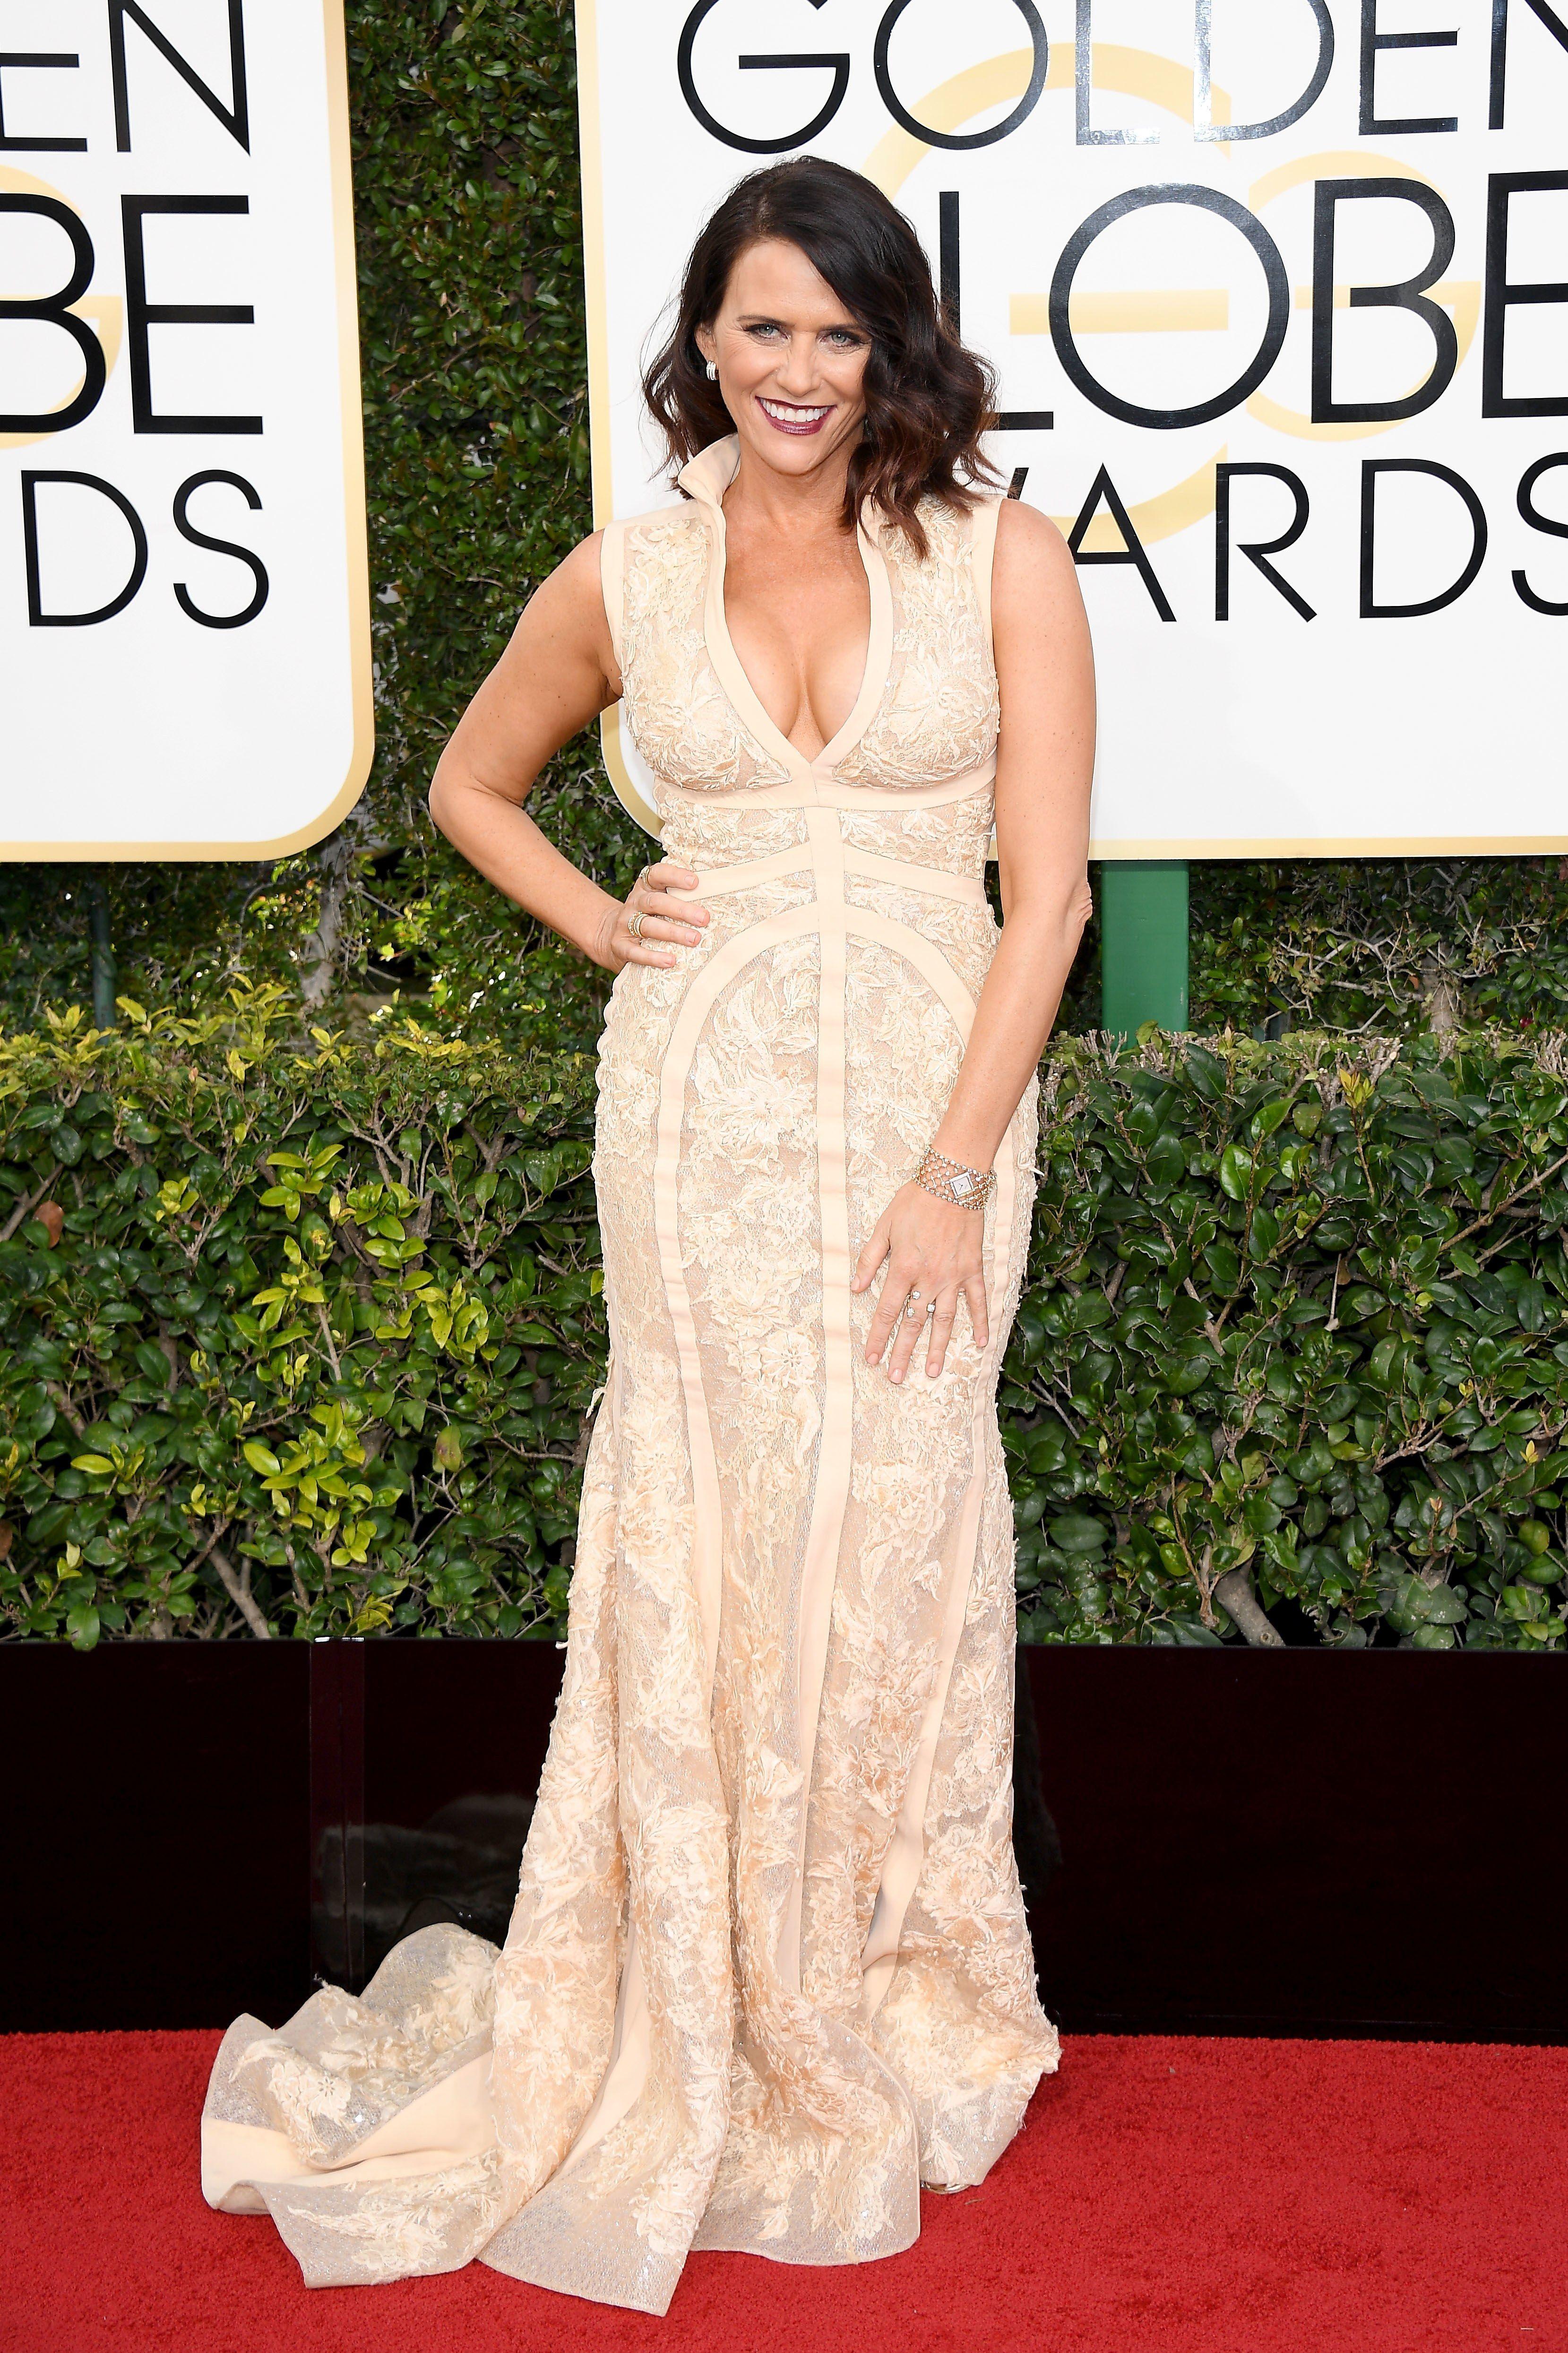 Amy Landecker at the 2017 Golden Globe Awards